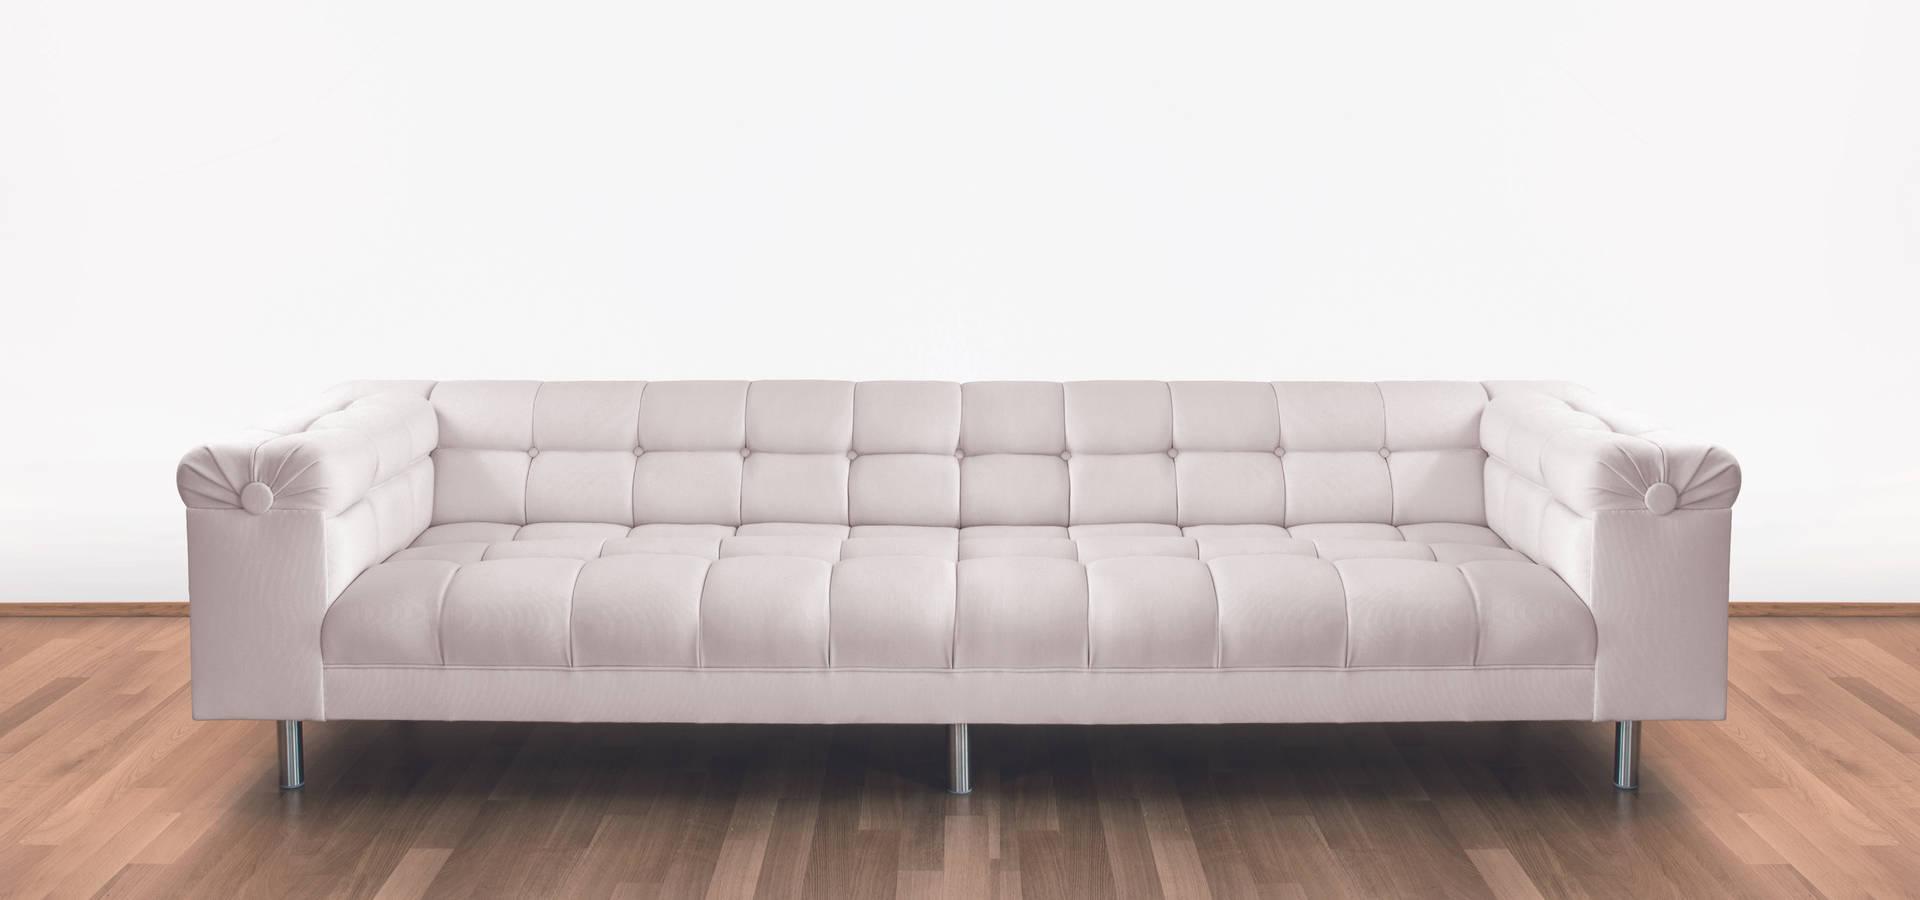 uh wand raum gmbh raumausstatter interior designer. Black Bedroom Furniture Sets. Home Design Ideas